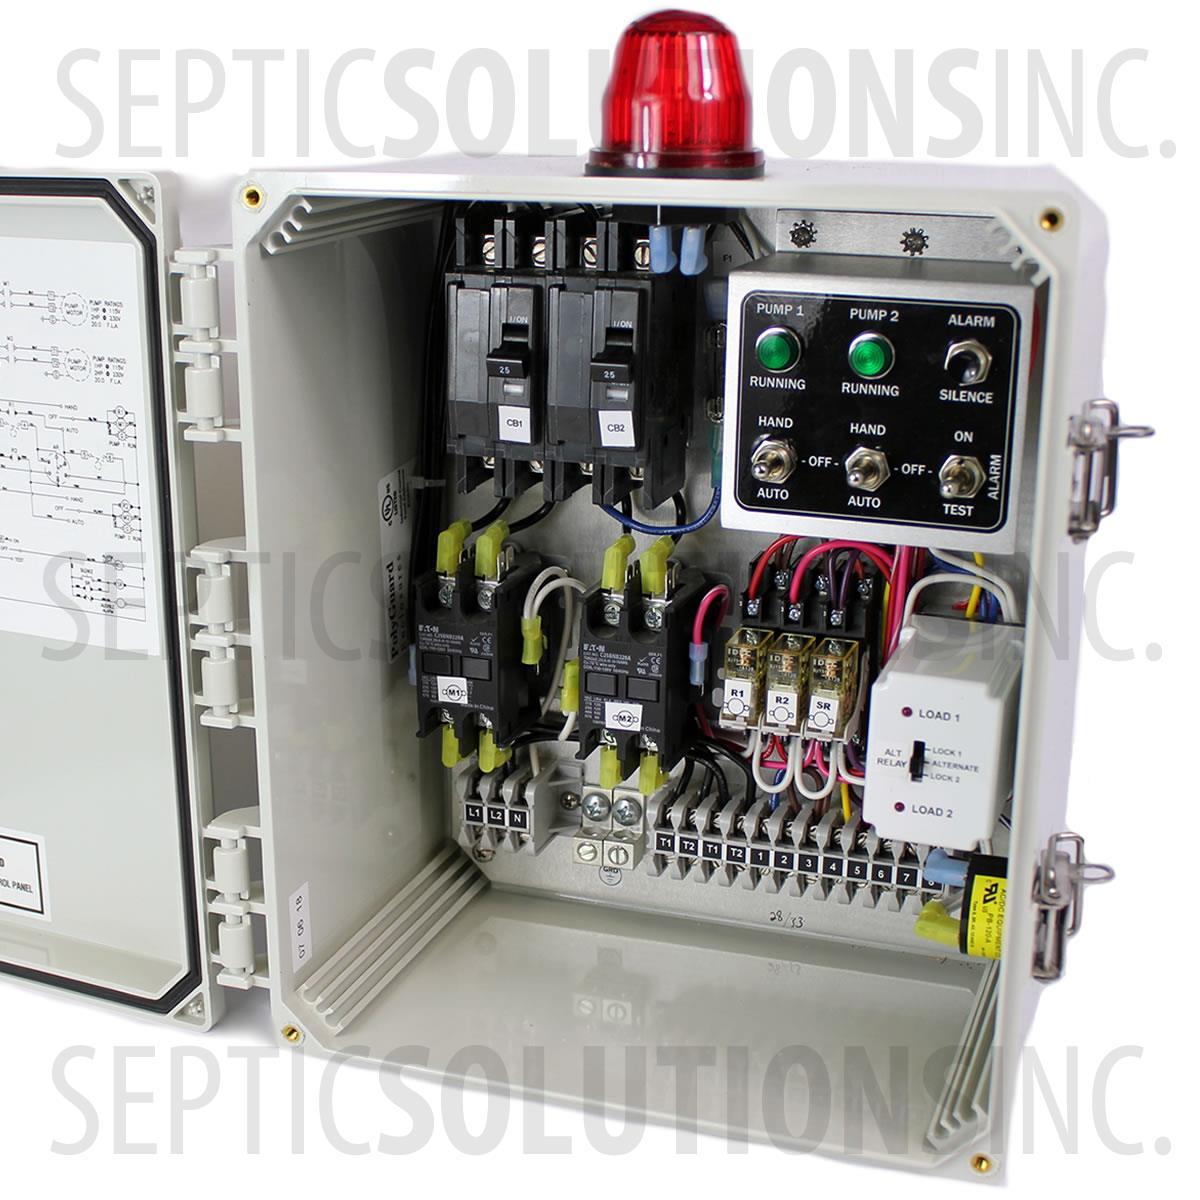 small resolution of myers duplex pump control panel wiring diagram 1 wiring diagram duplex sewage pump control panels free